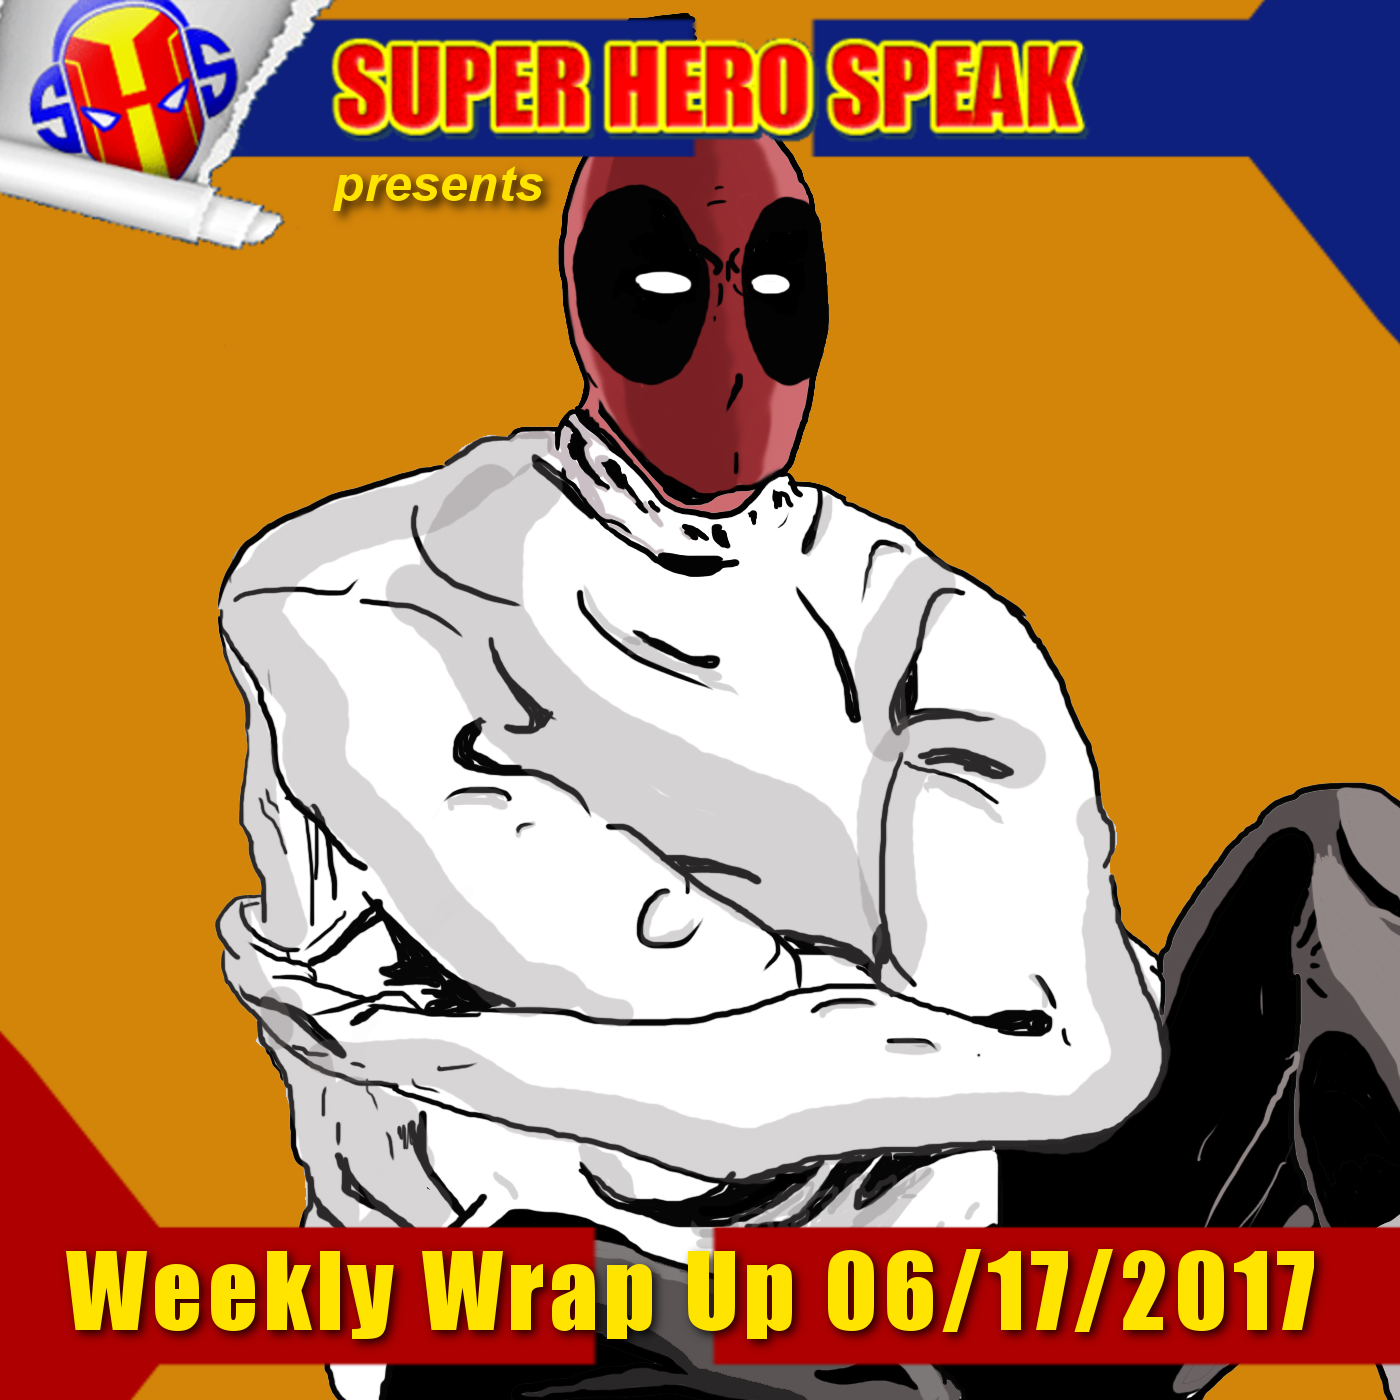 SHS Weekly Wrap up 6/17/2017